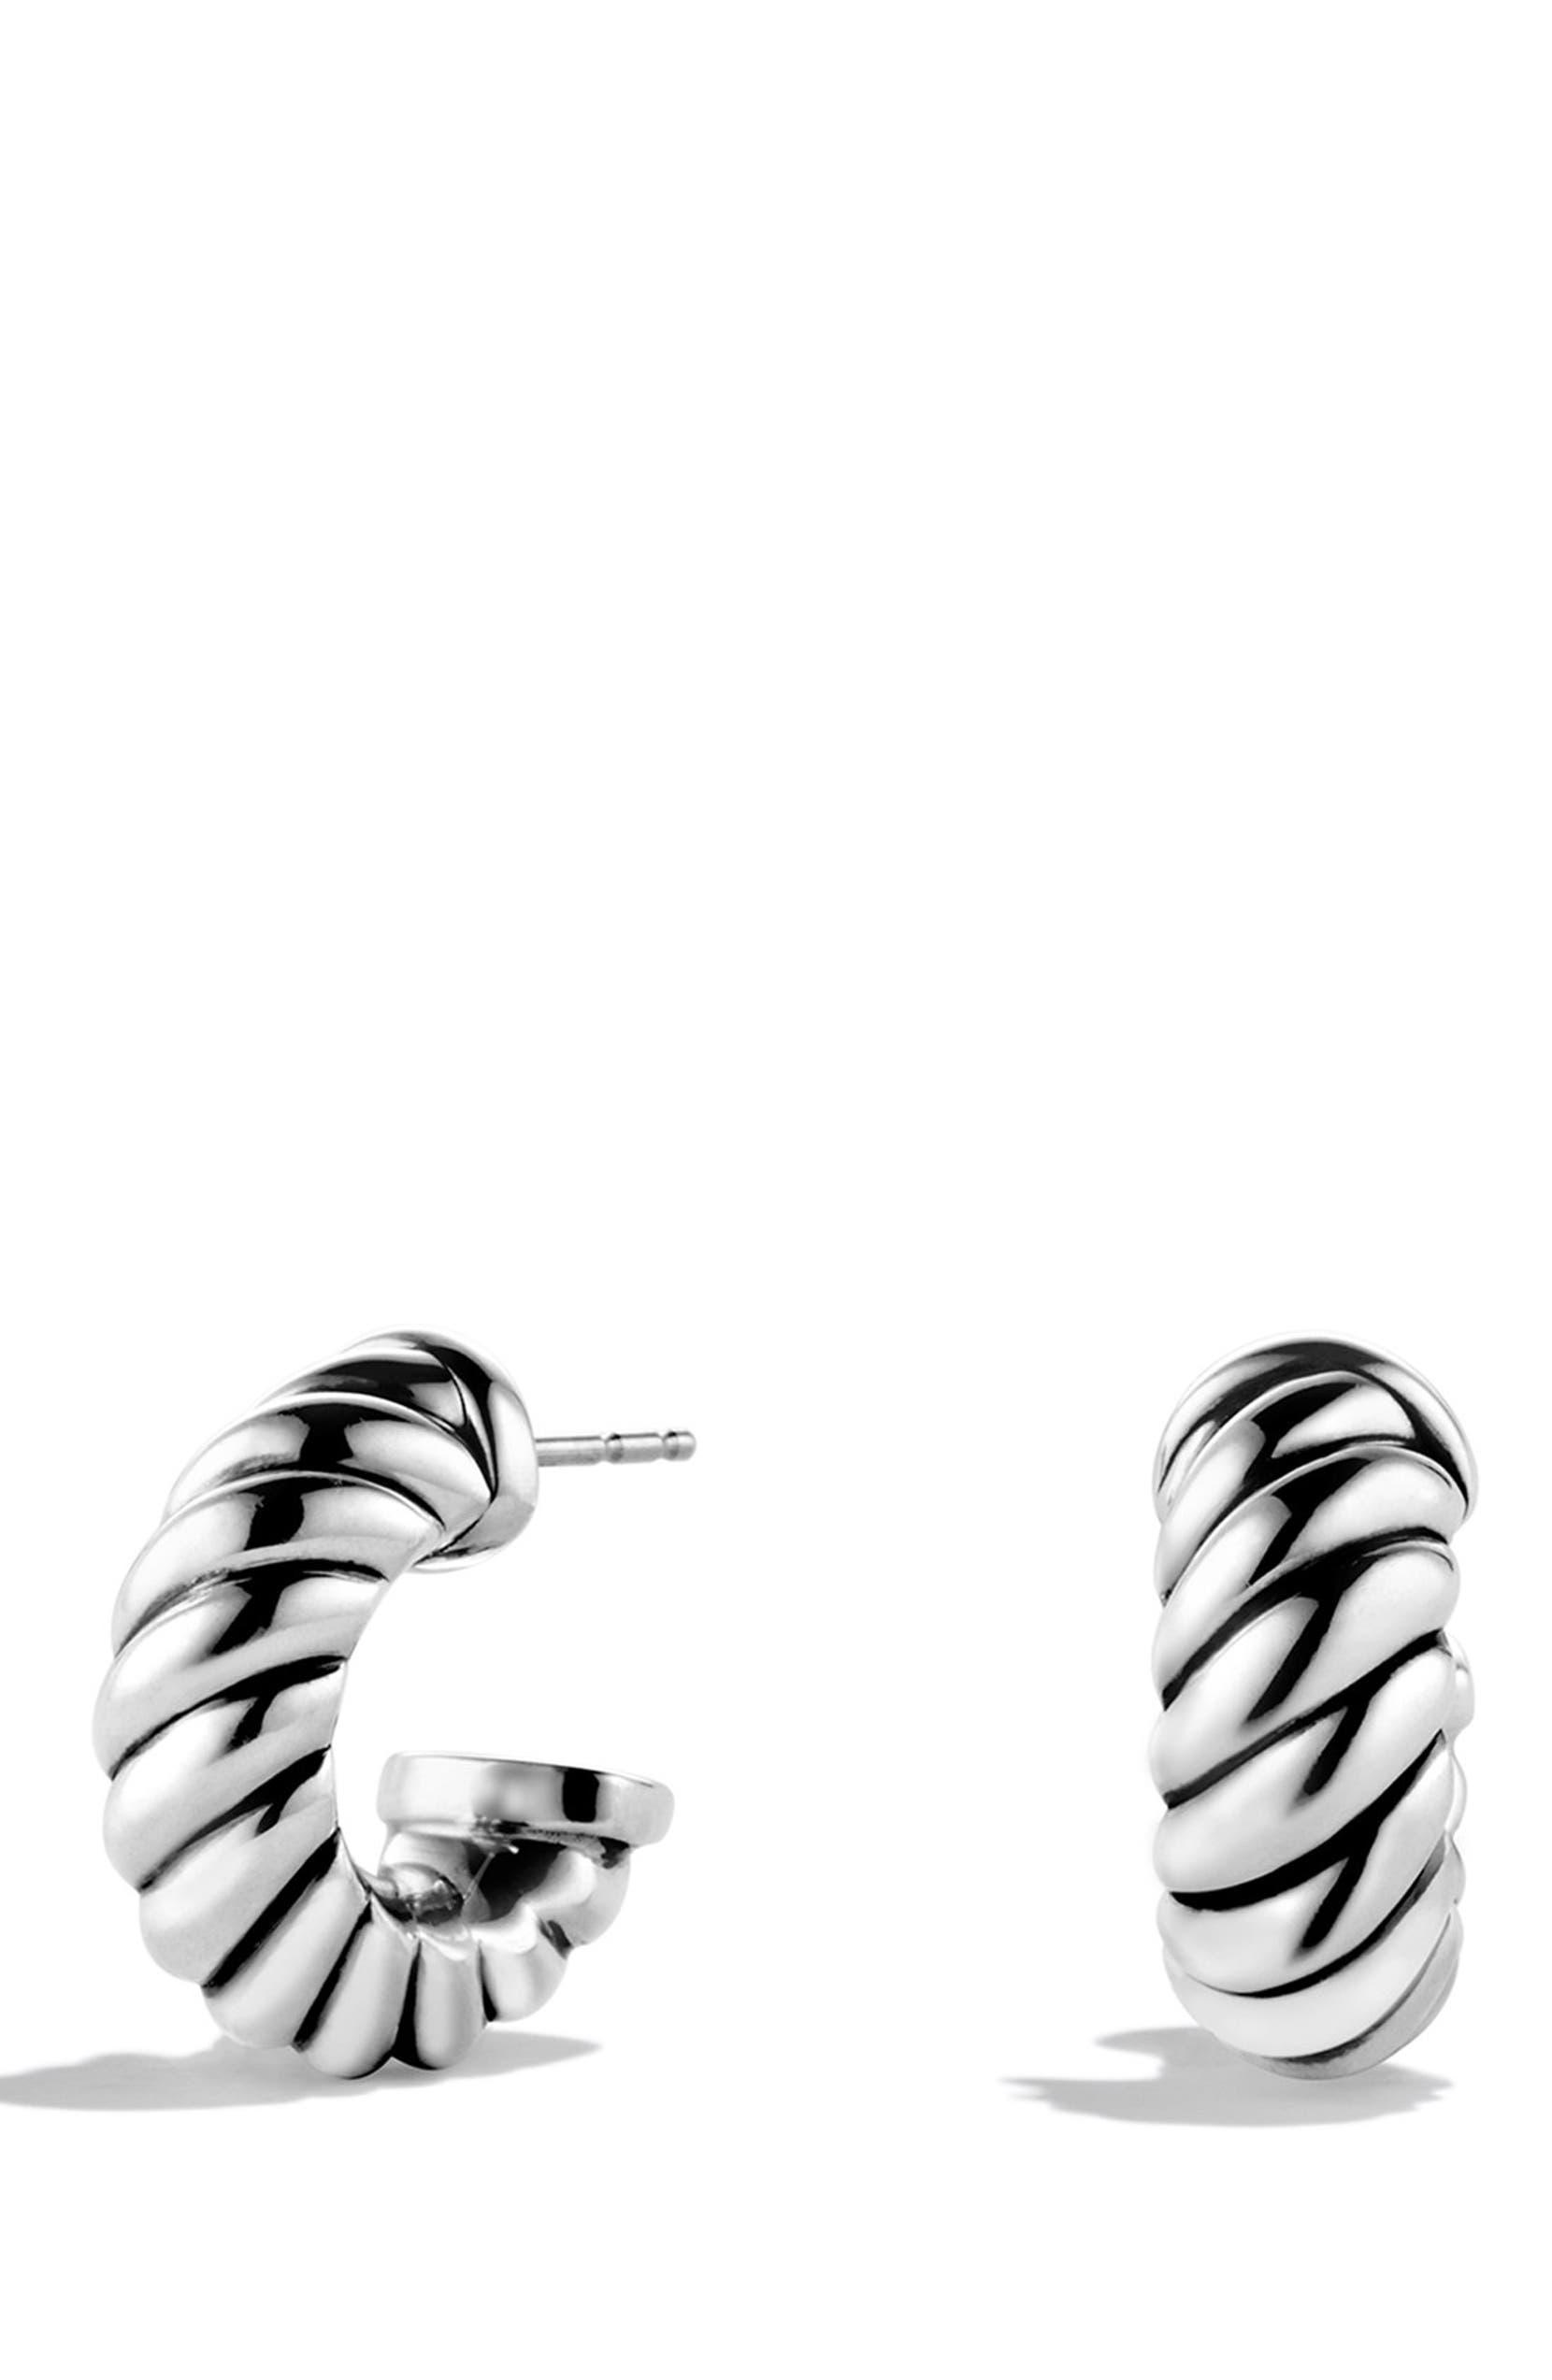 b7615cc98d7f9 'Cable Classics' Shrimp Earrings